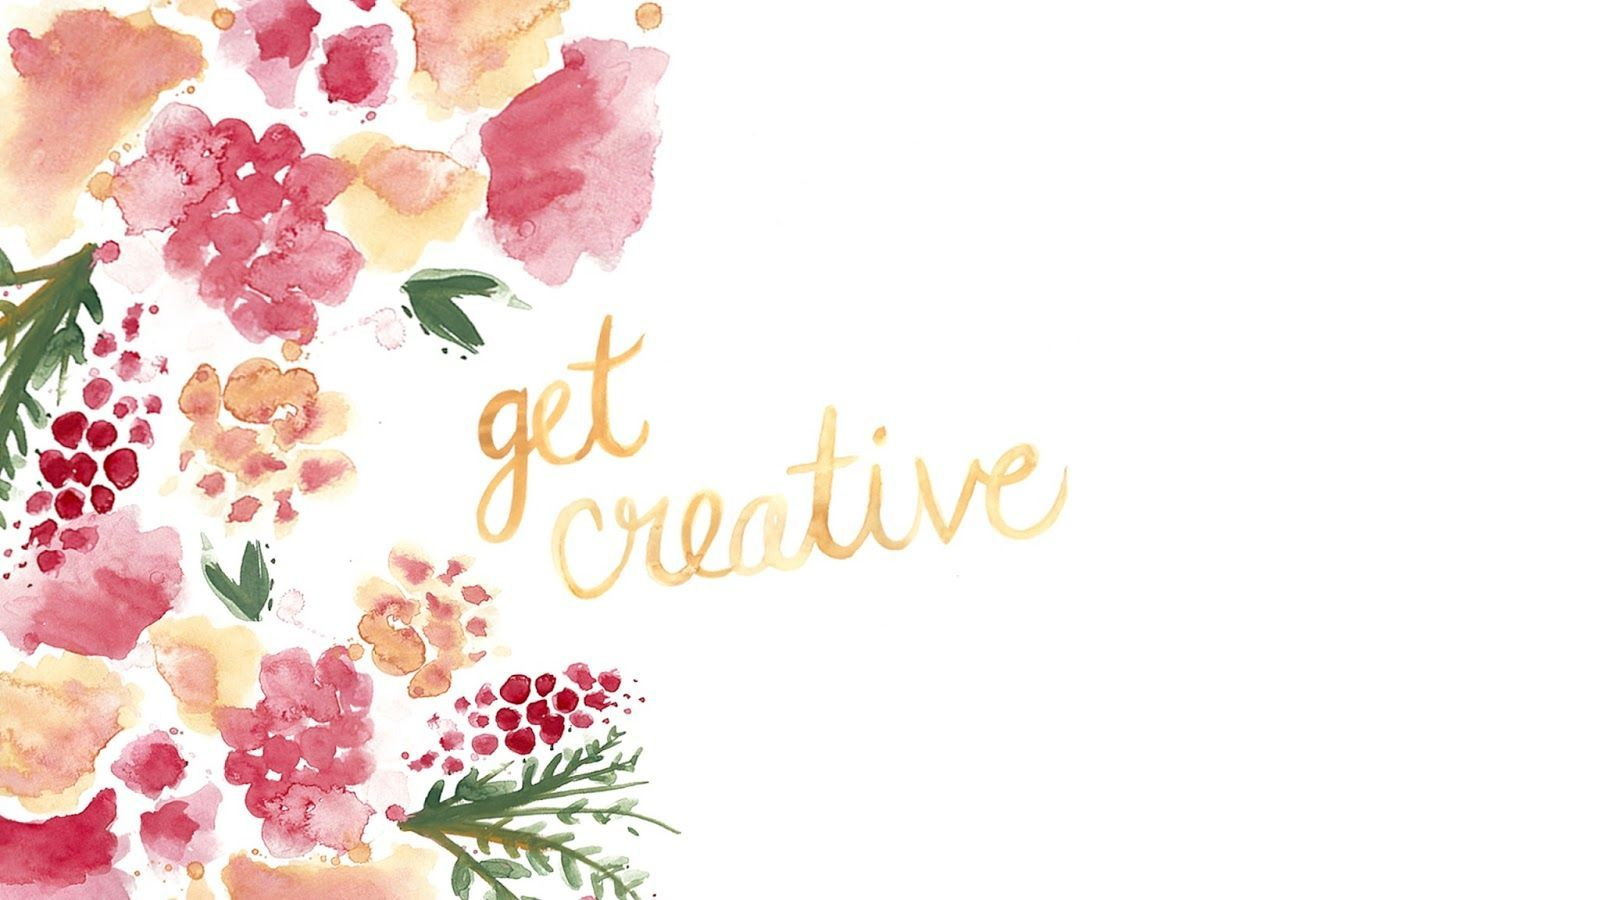 Best Of Pinterest Aesthetic Wallpaper Laptop Quotes Pictures Kate Spade Desktop Wallpaper Macbook Wallpaper Spring Desktop Wallpaper